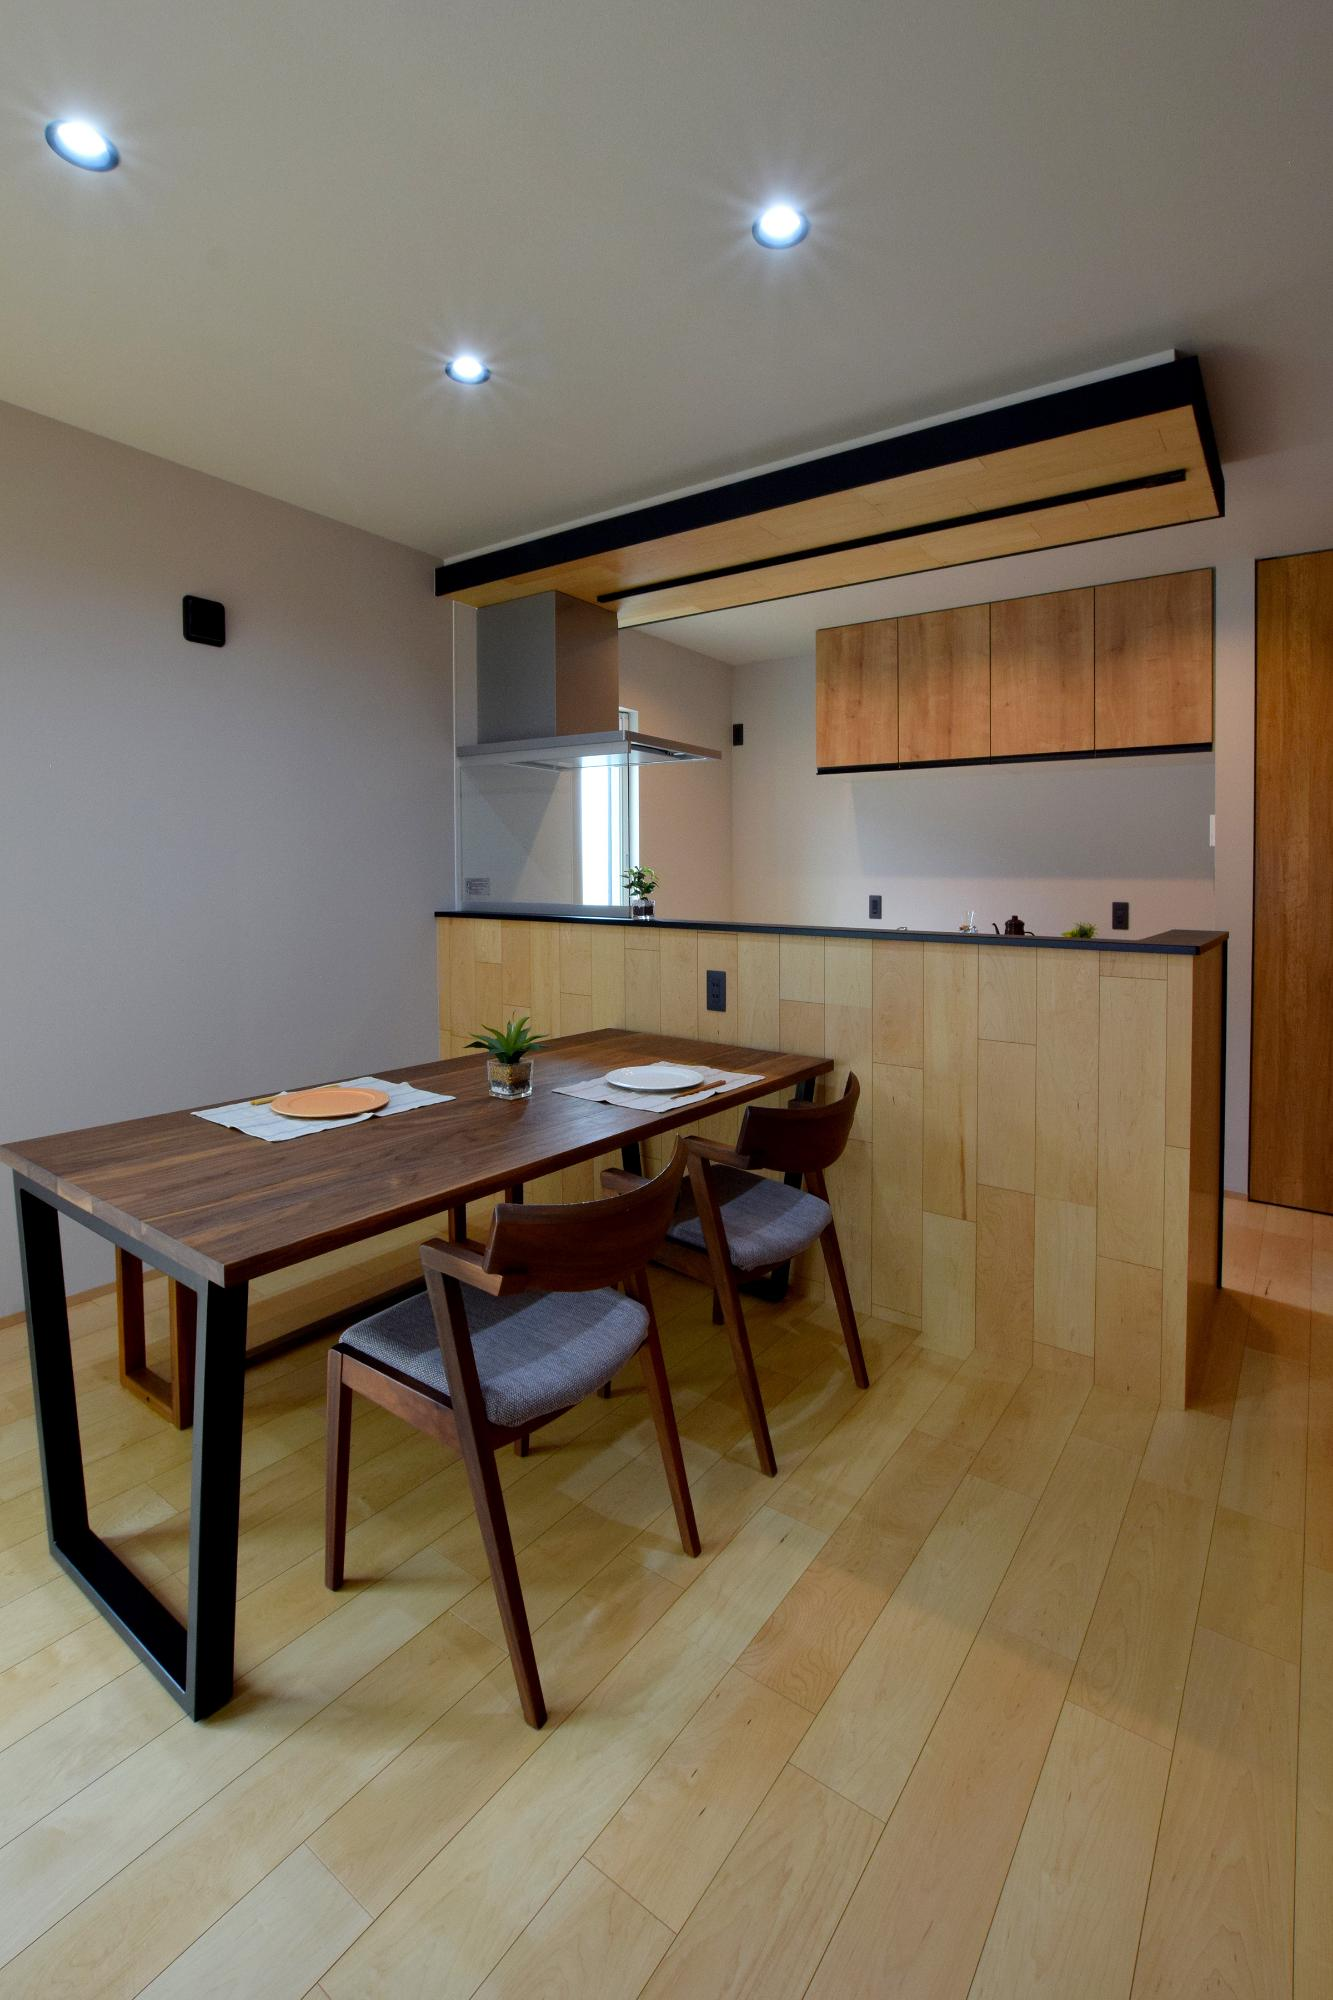 DETAIL HOME(ディテールホーム)「ハコ型という選択×耐震3の家」のシンプル・ナチュラルなキッチンの実例写真